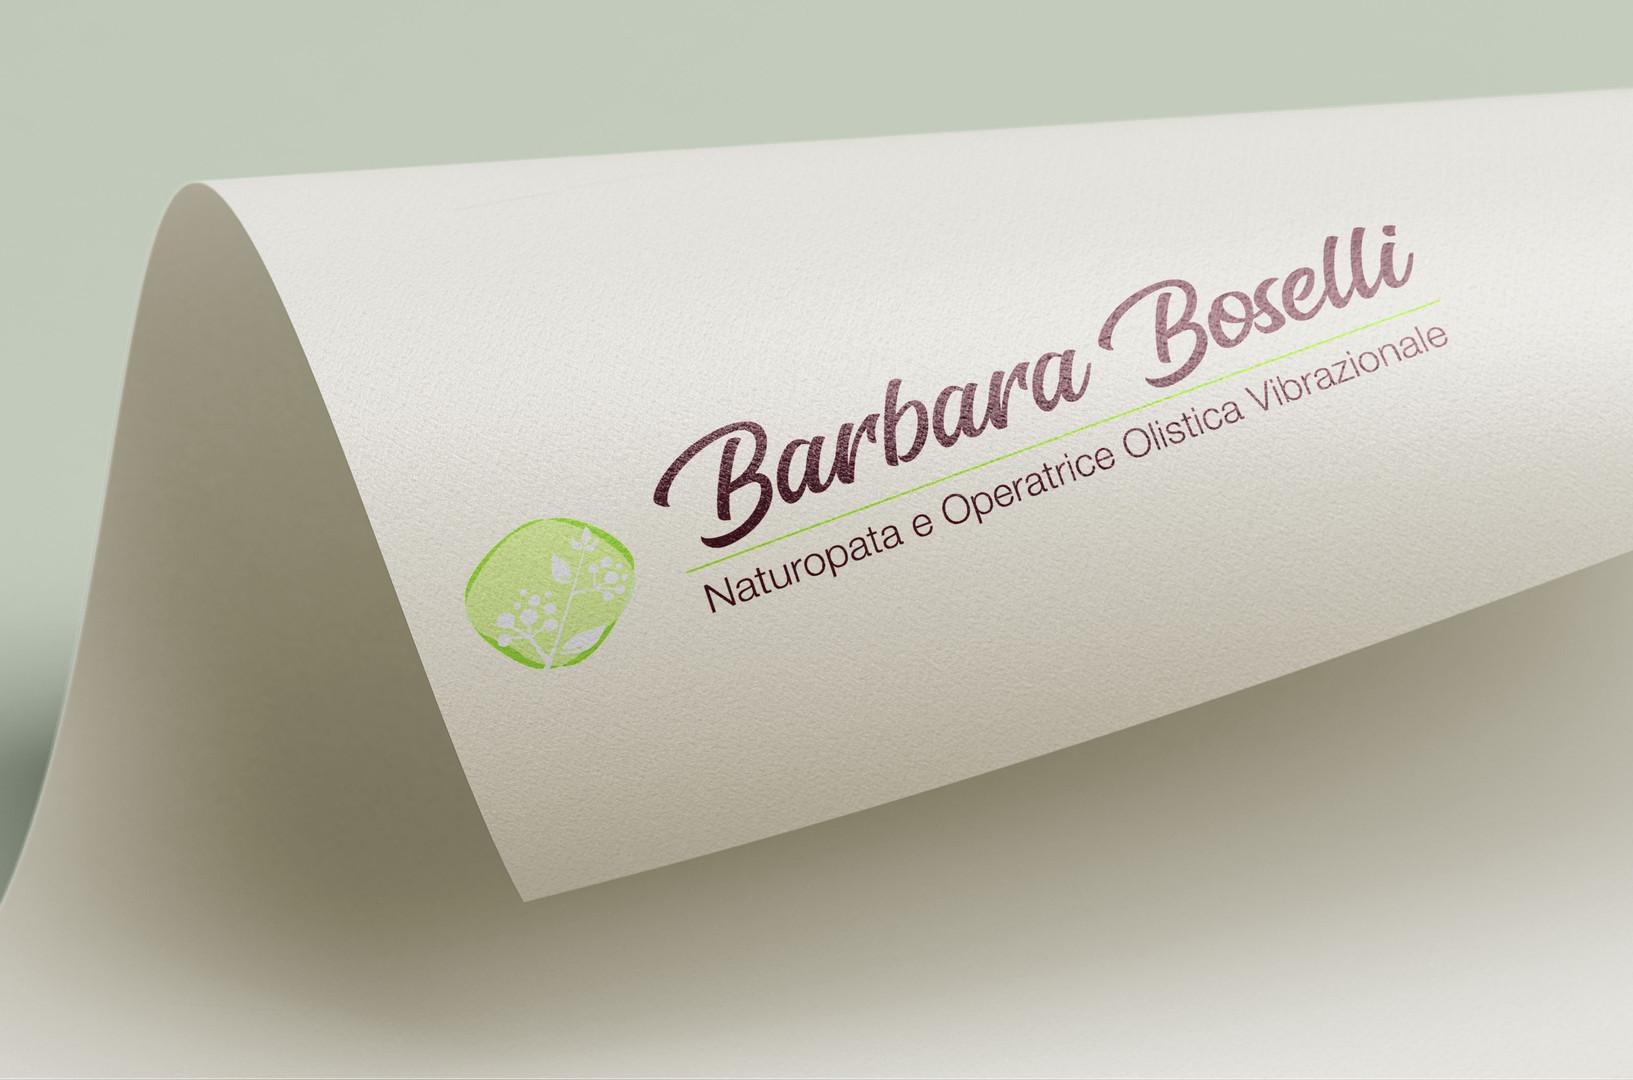 Barbara Boselli - Web and Brand